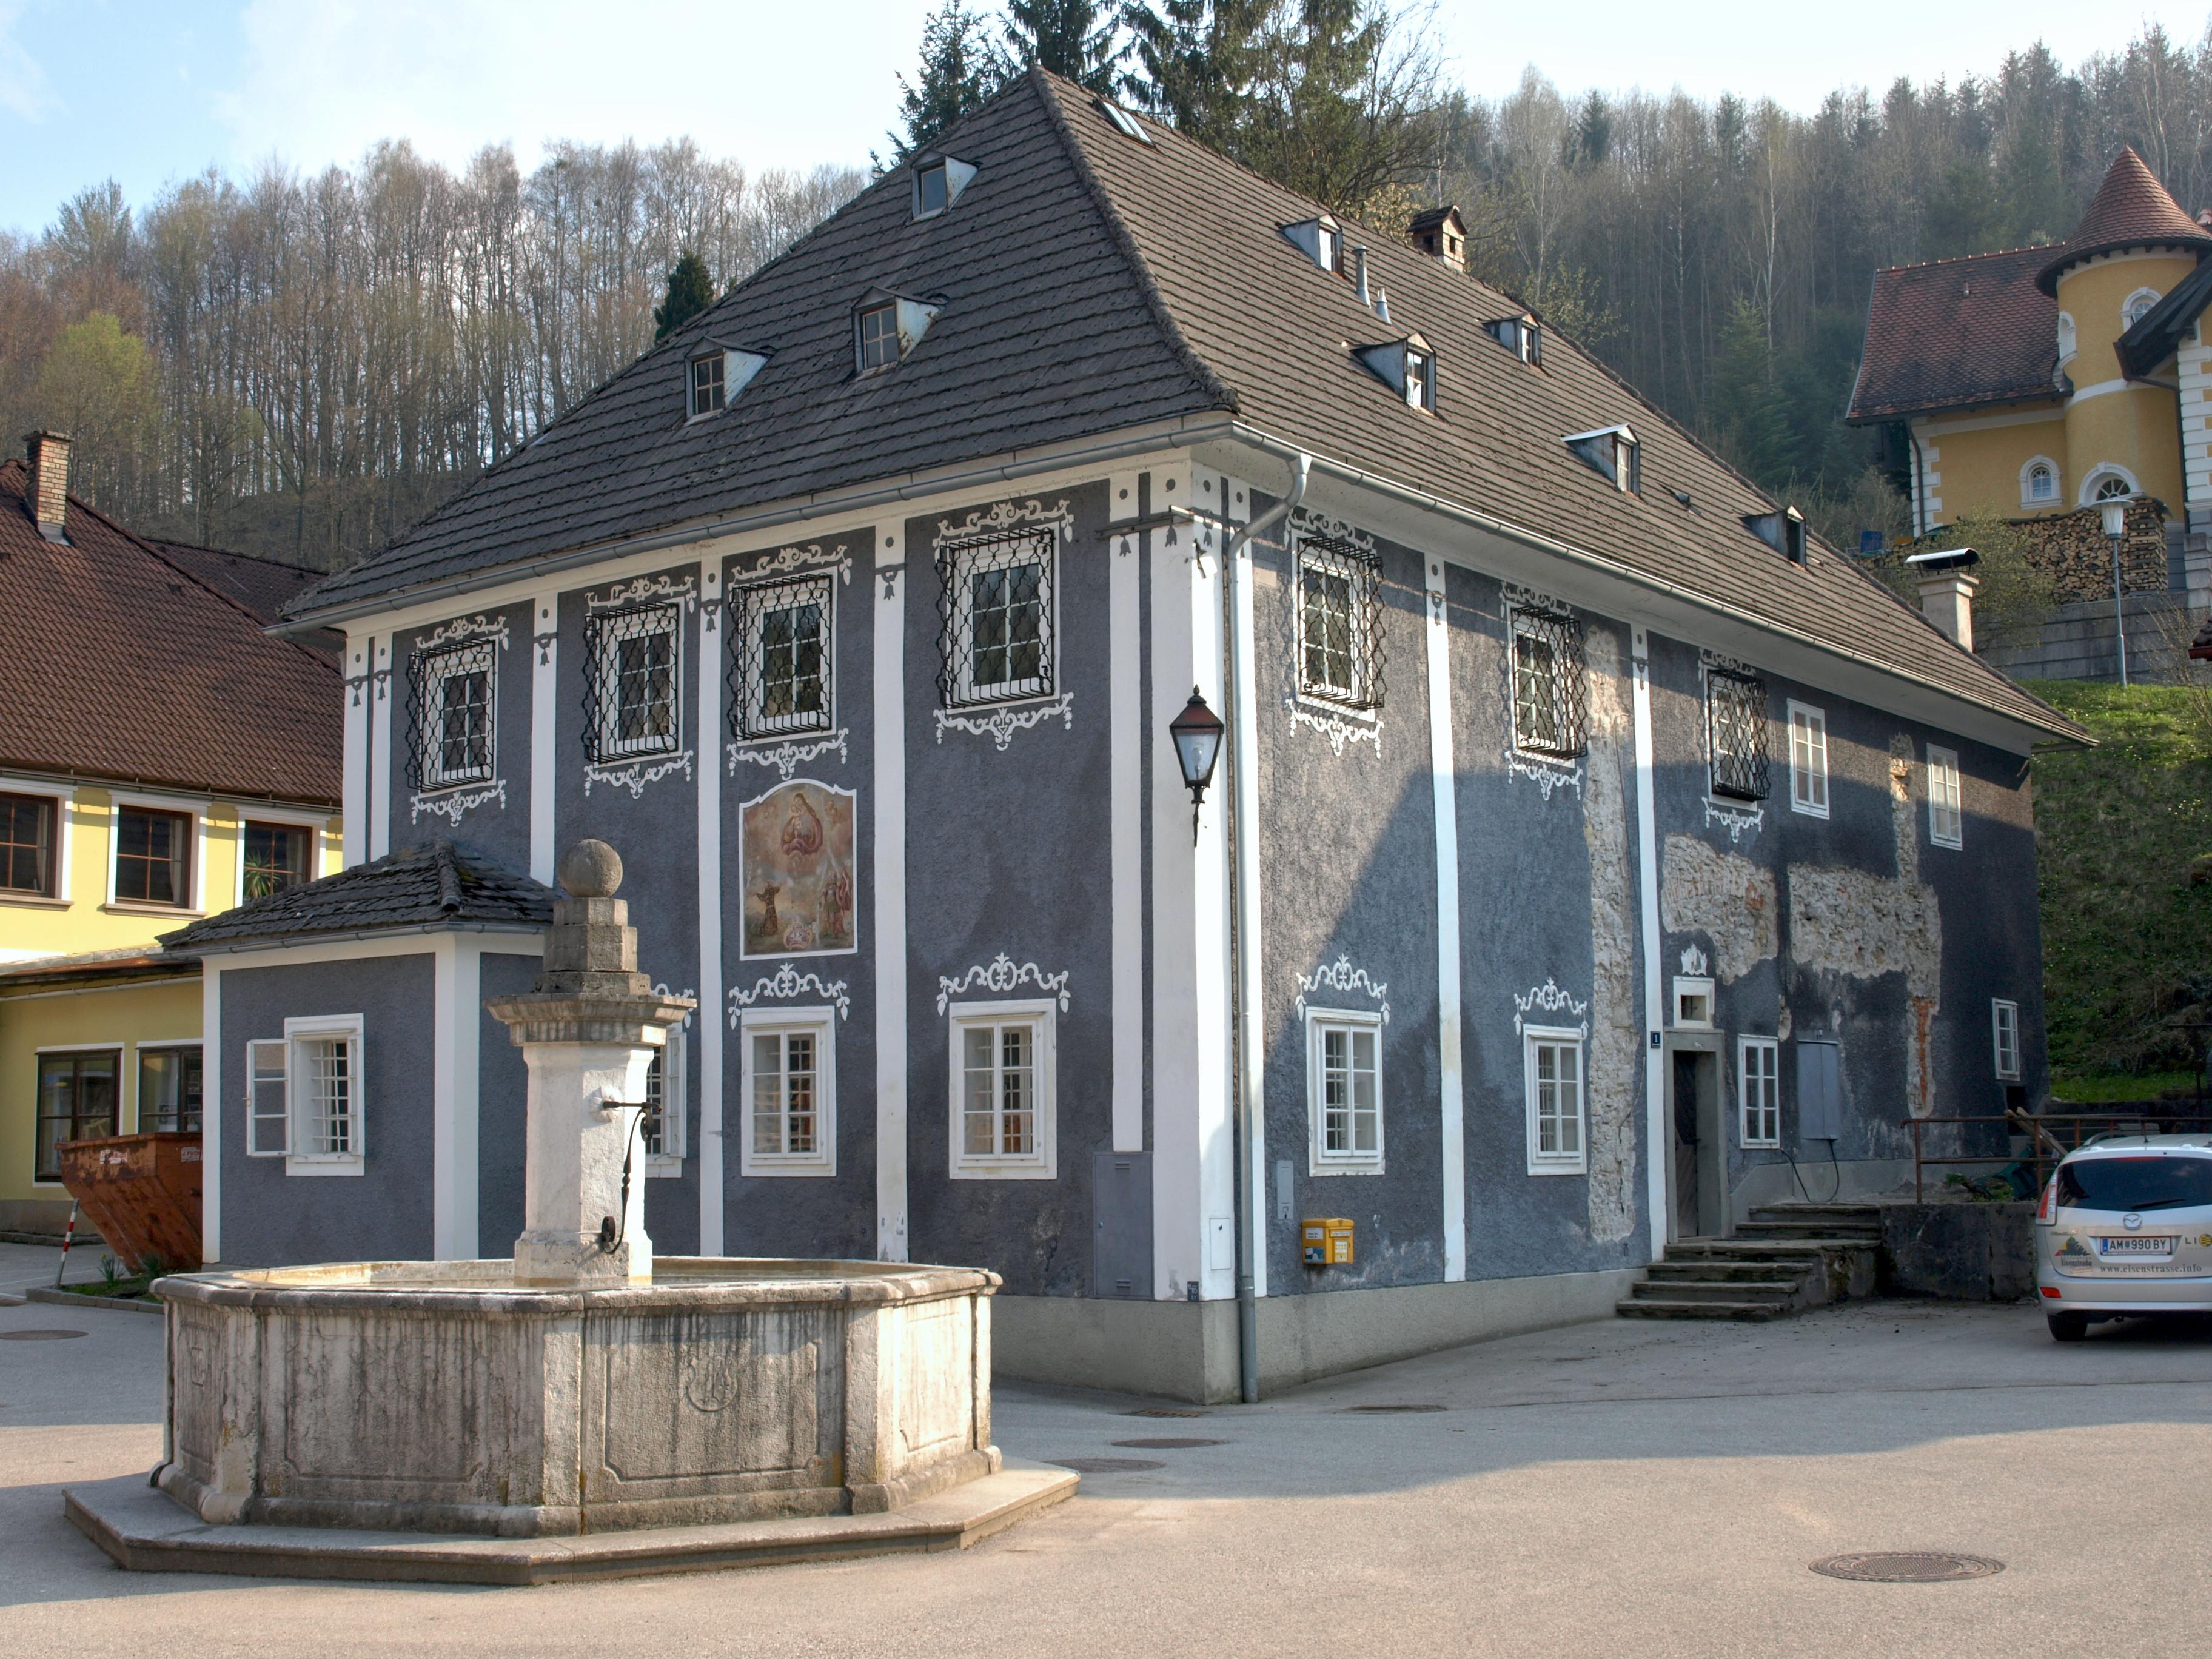 Free Ybbsitz, Austria Events | Eventbrite